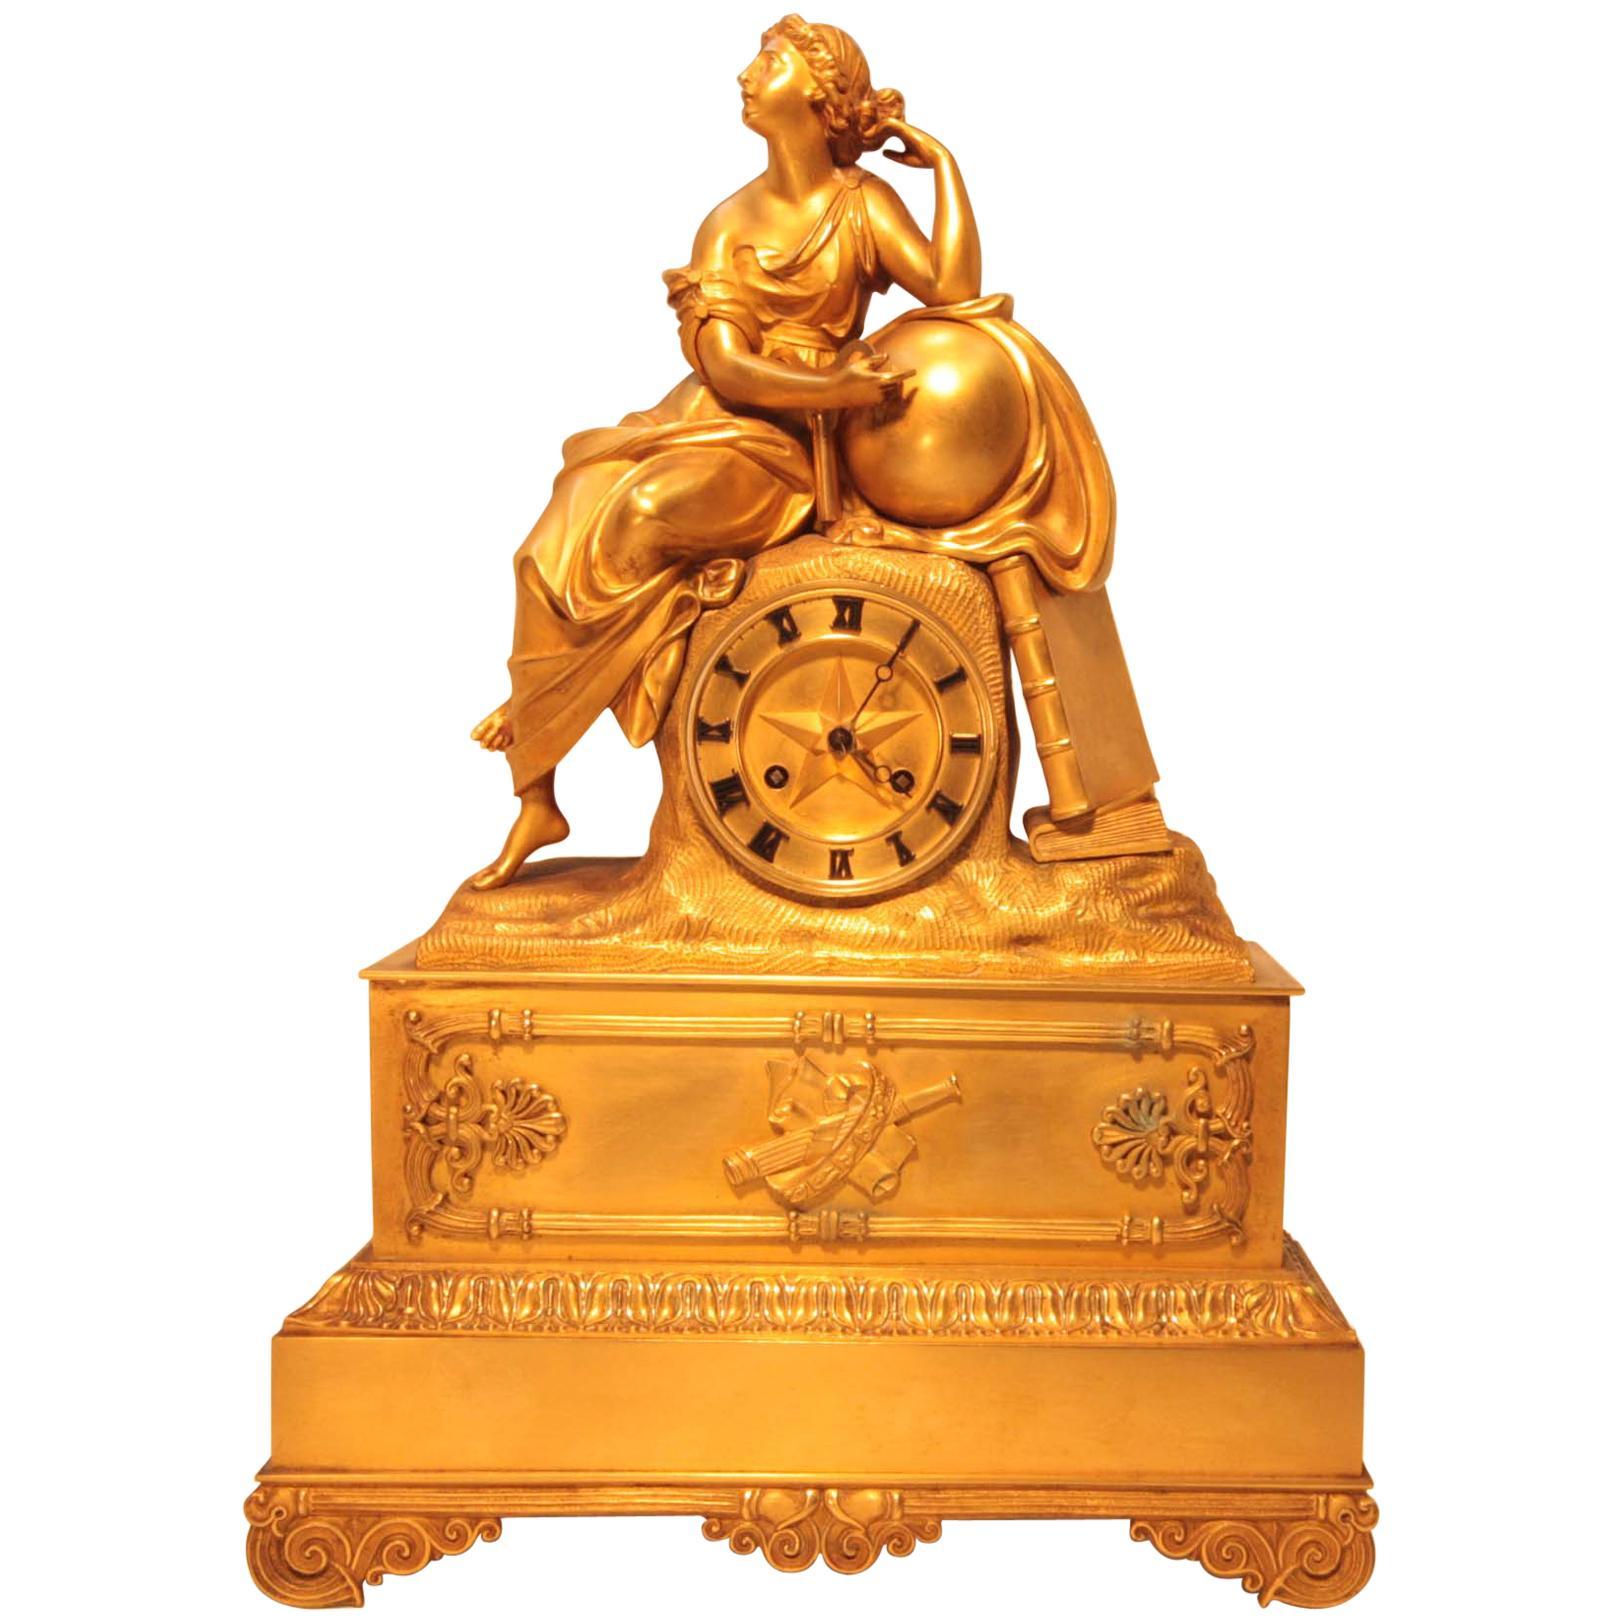 Charles X Figural Ormolu Mantel Clock Depicting Urania